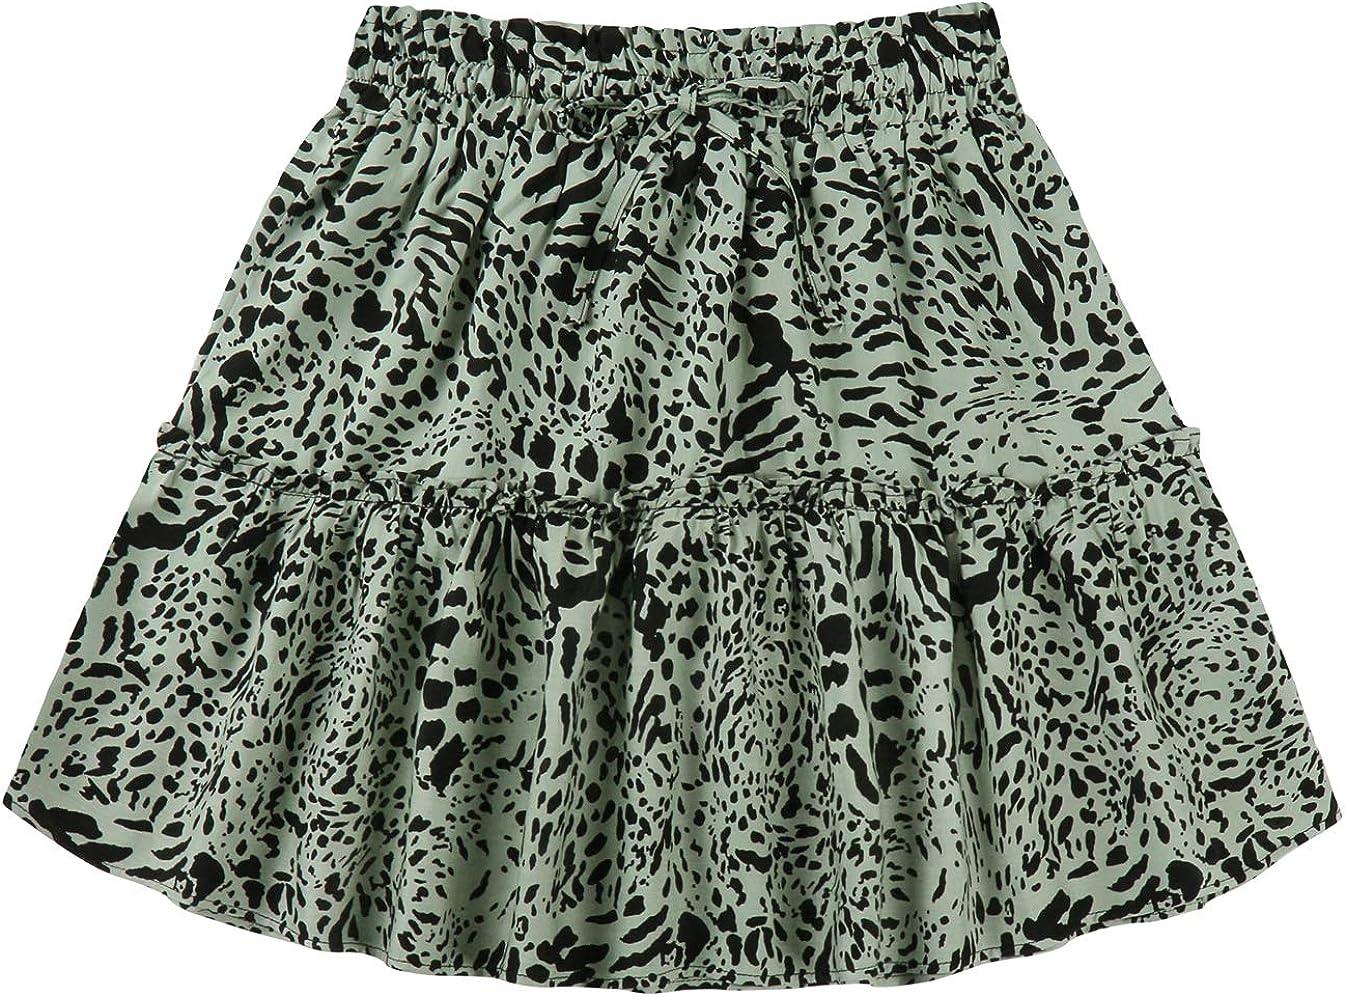 Kormei Women's Ruffled Boho Floral Print High Waist Drawstring Mini Short Flared Skirt